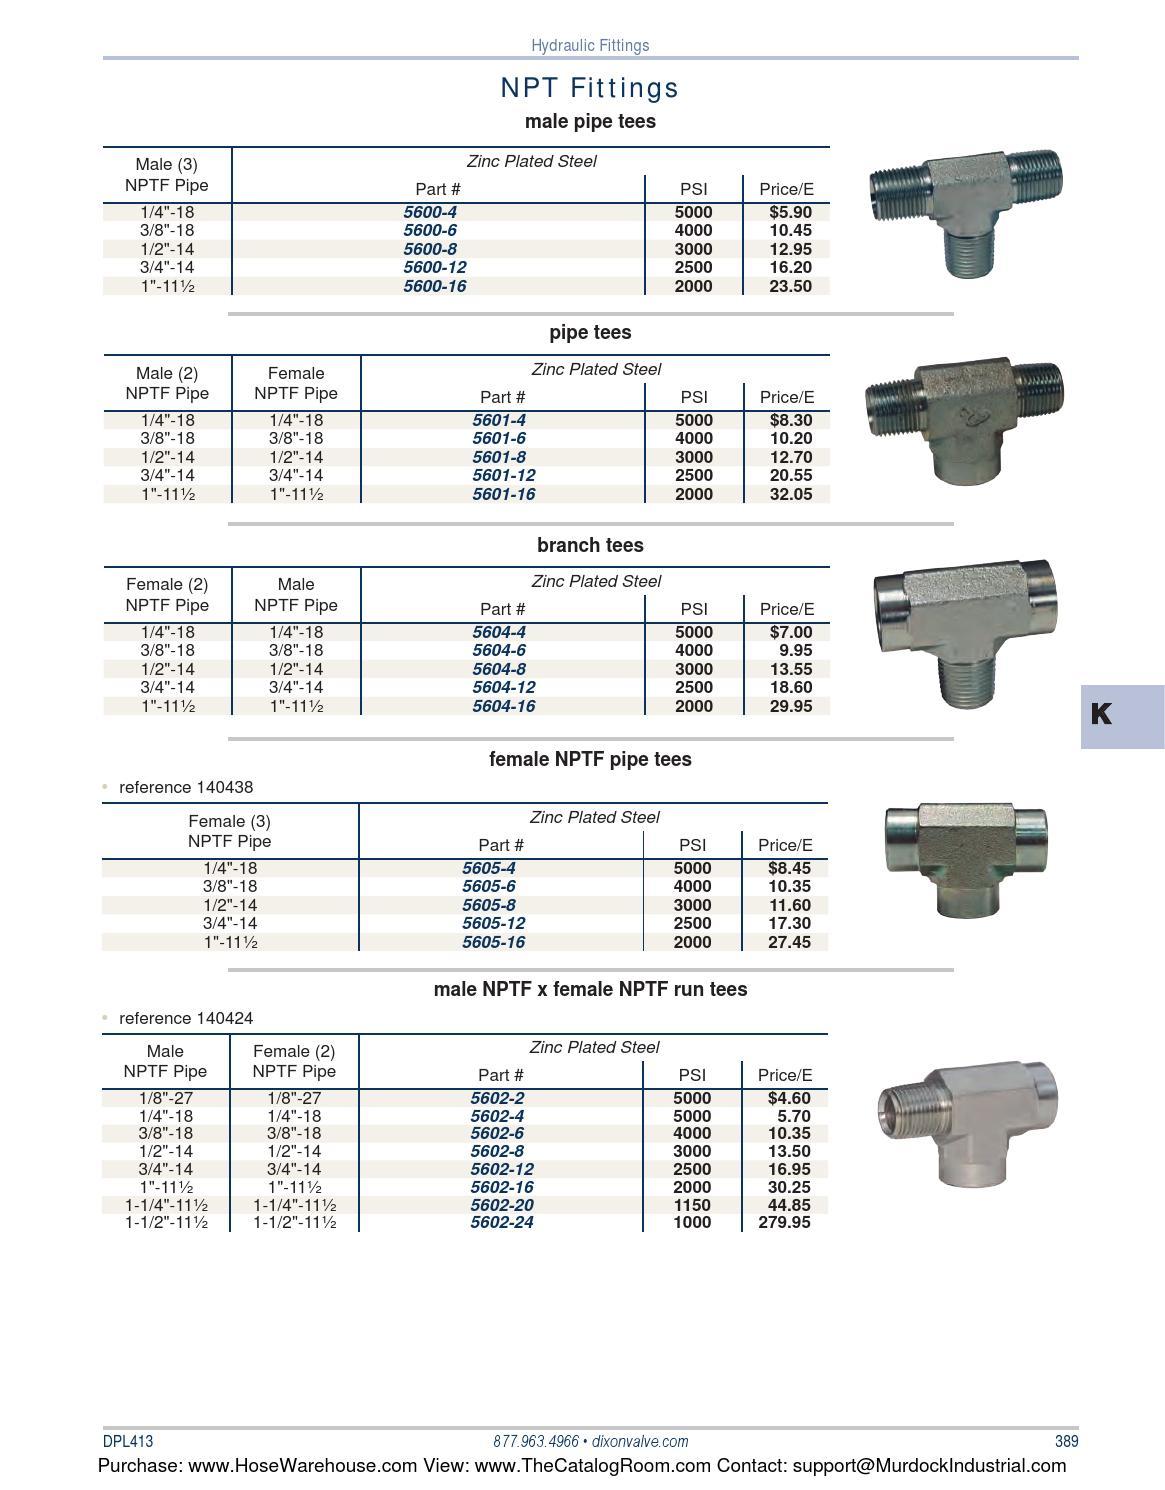 Dixon main catalog 2013 part 2 final by Murdock Industrial